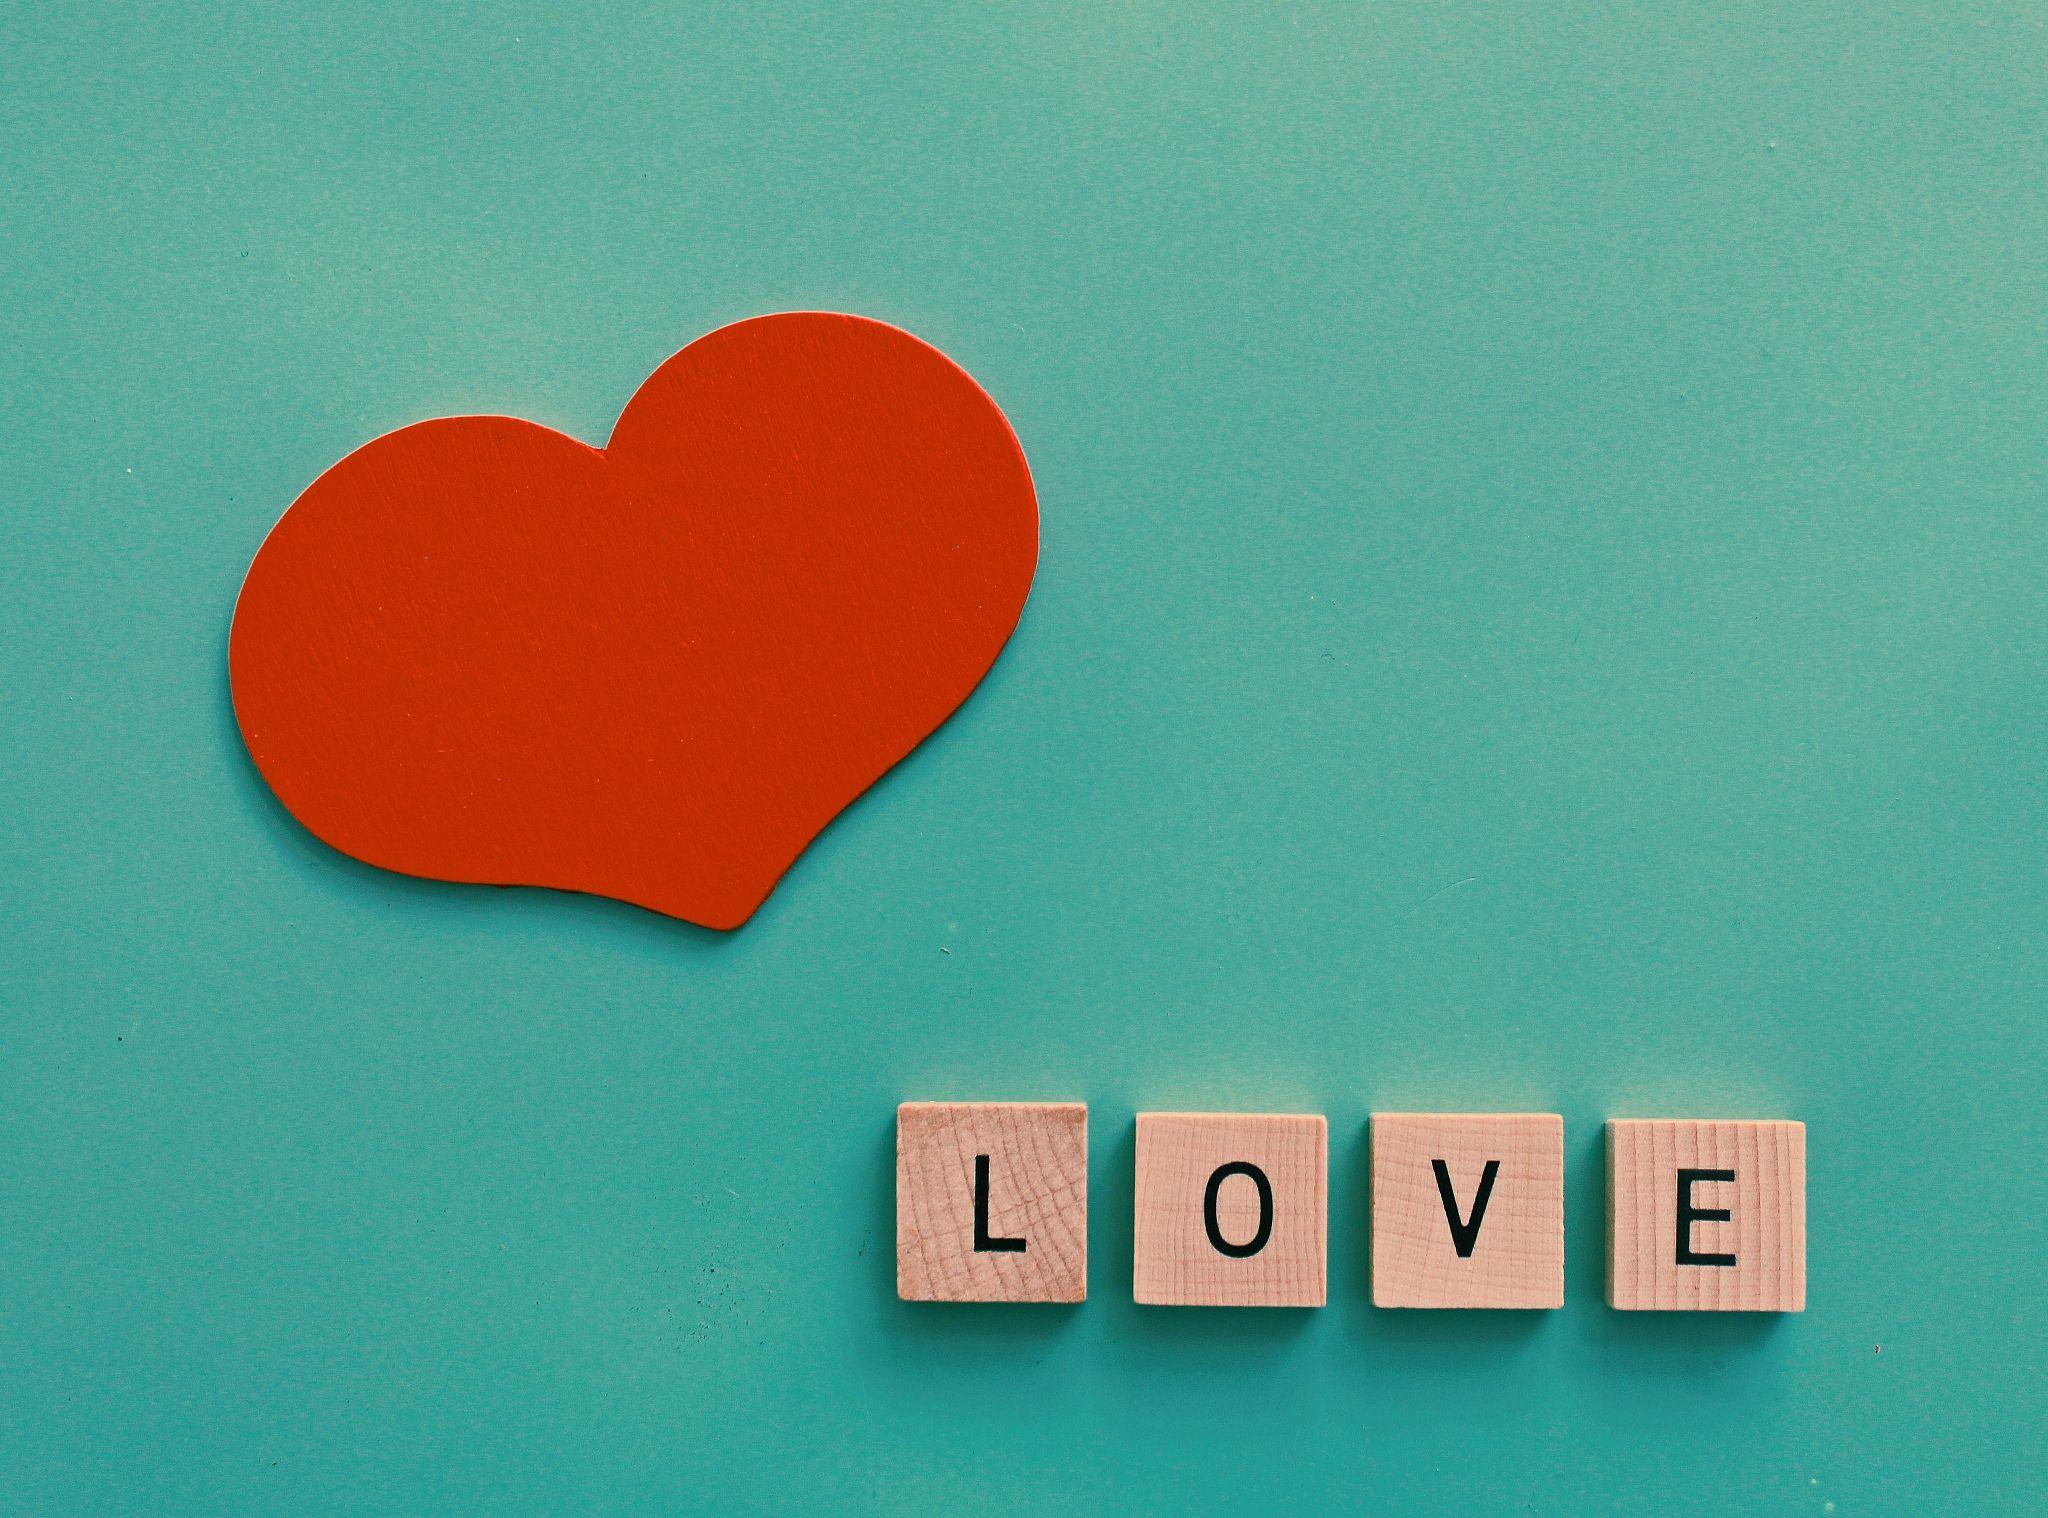 Happy Valentine's Day / Feliz Dia del Amor y la Amistad! by Marisa Nourbese on 500px